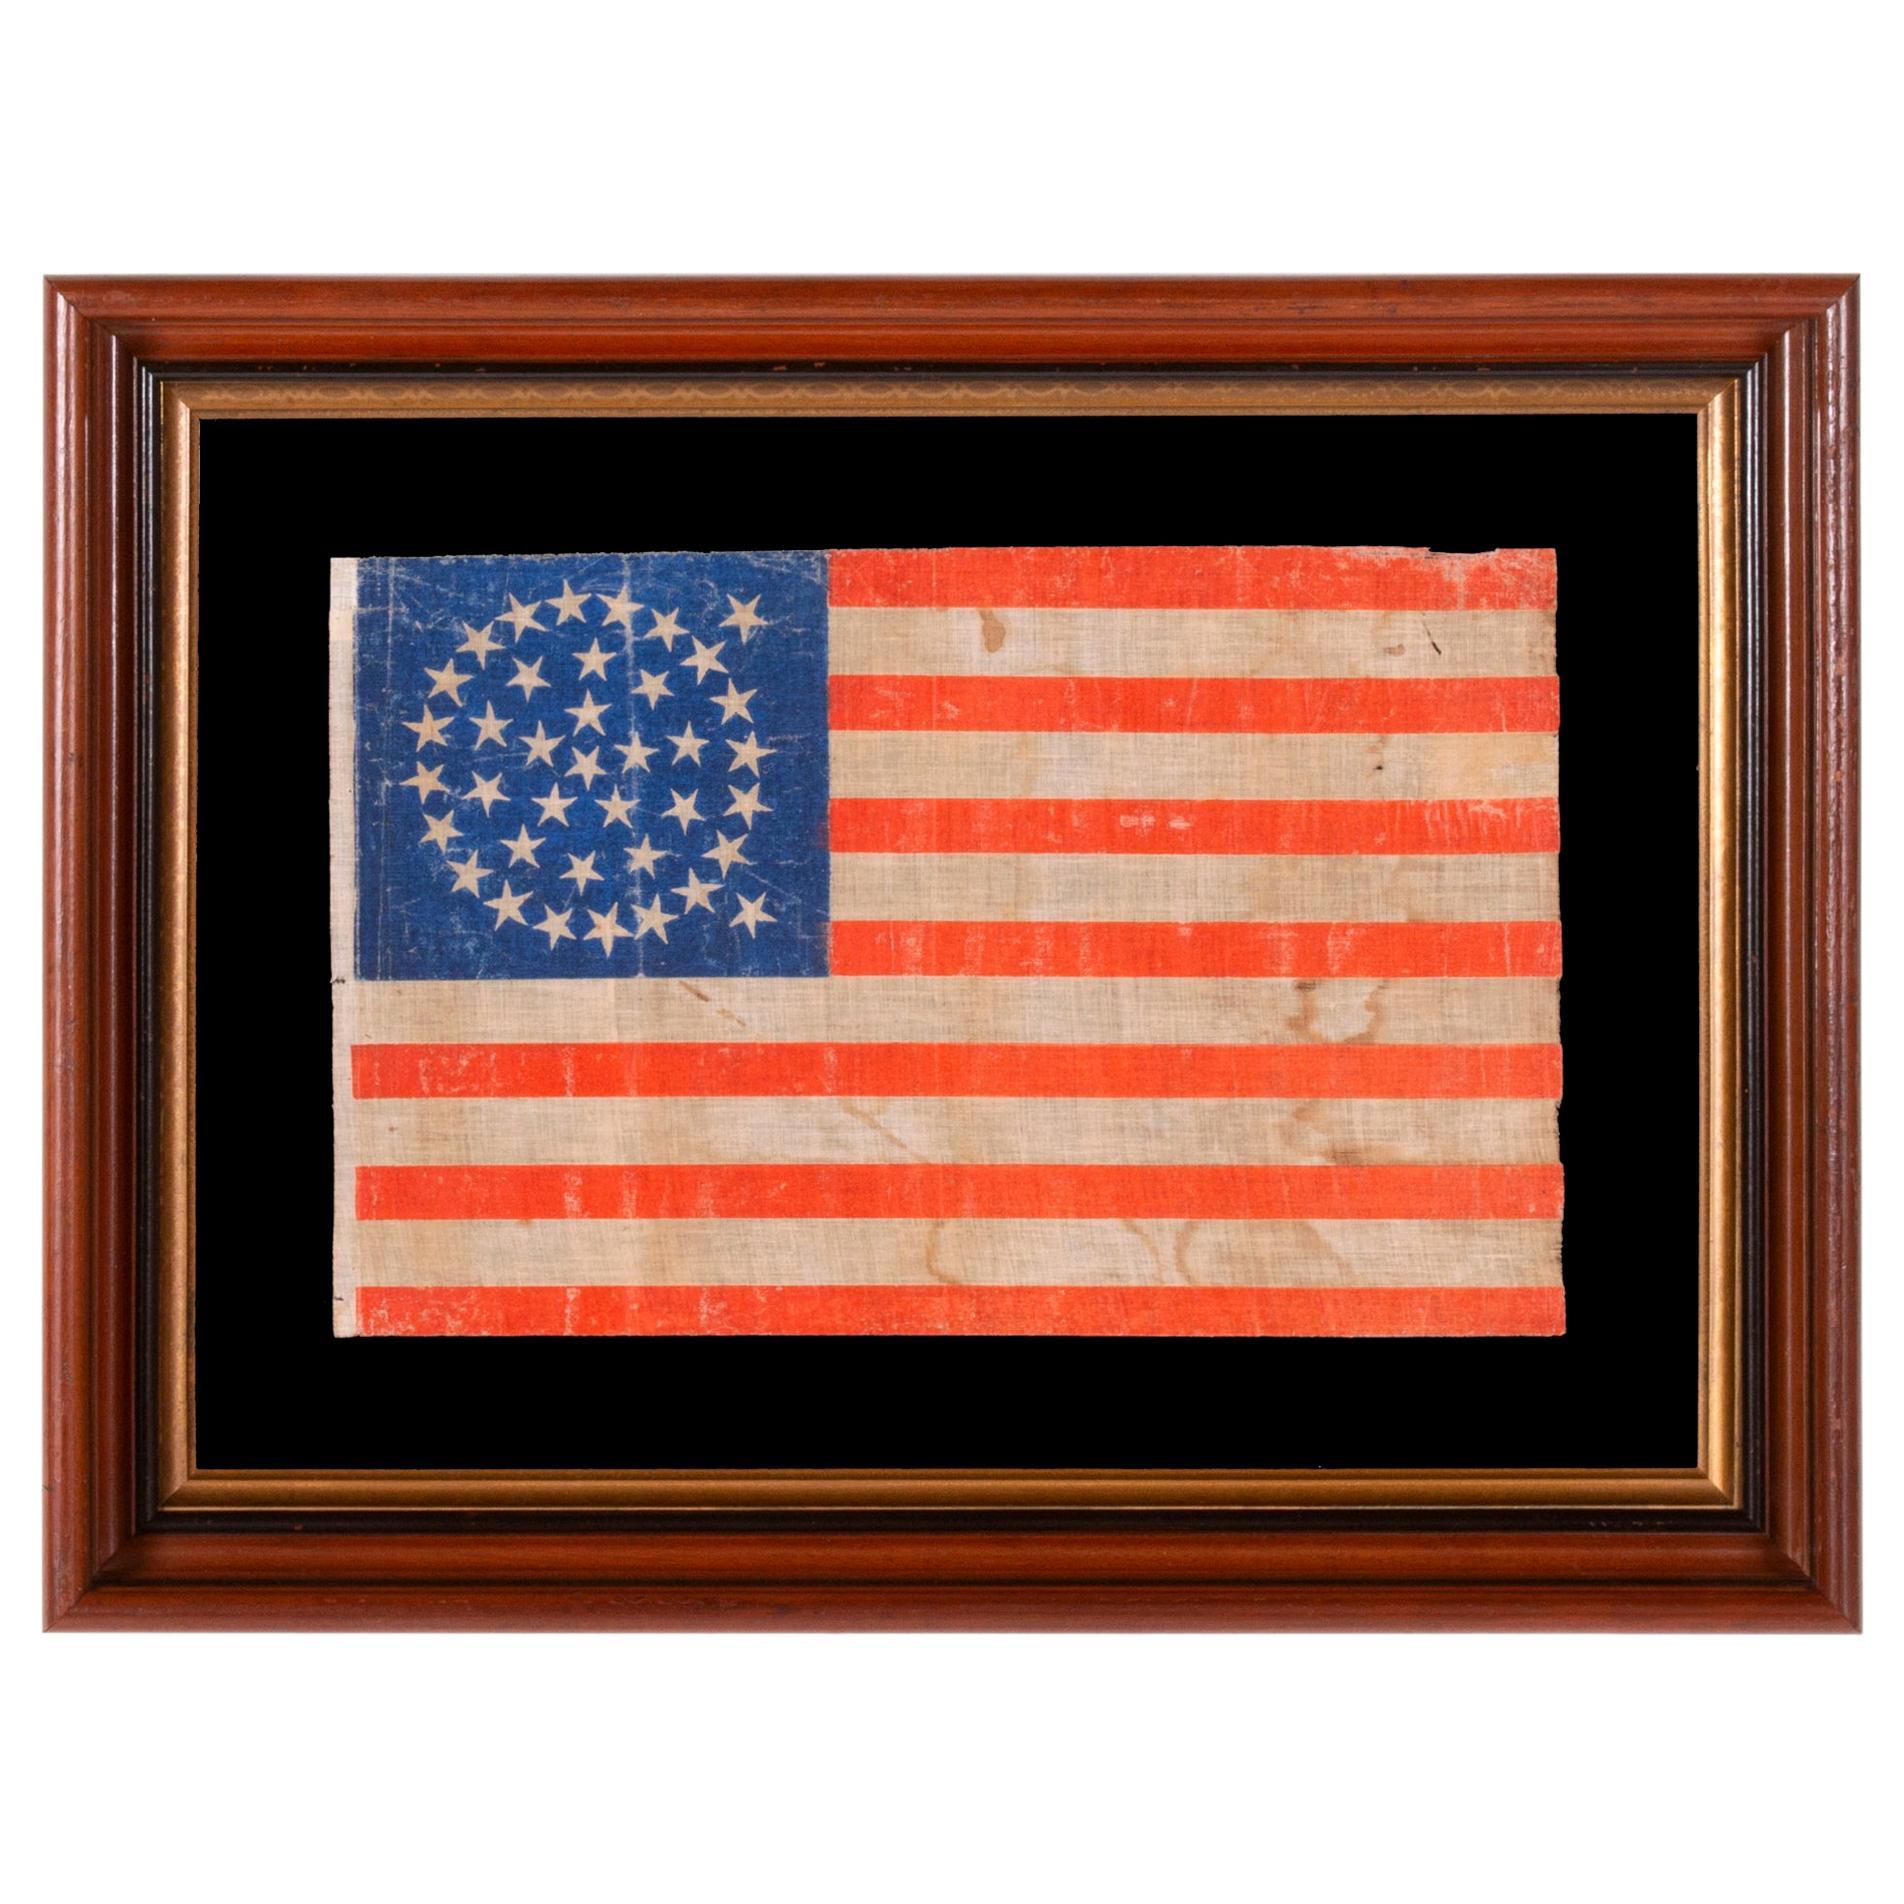 Colorado Statehood 38 Star American Parade Flag